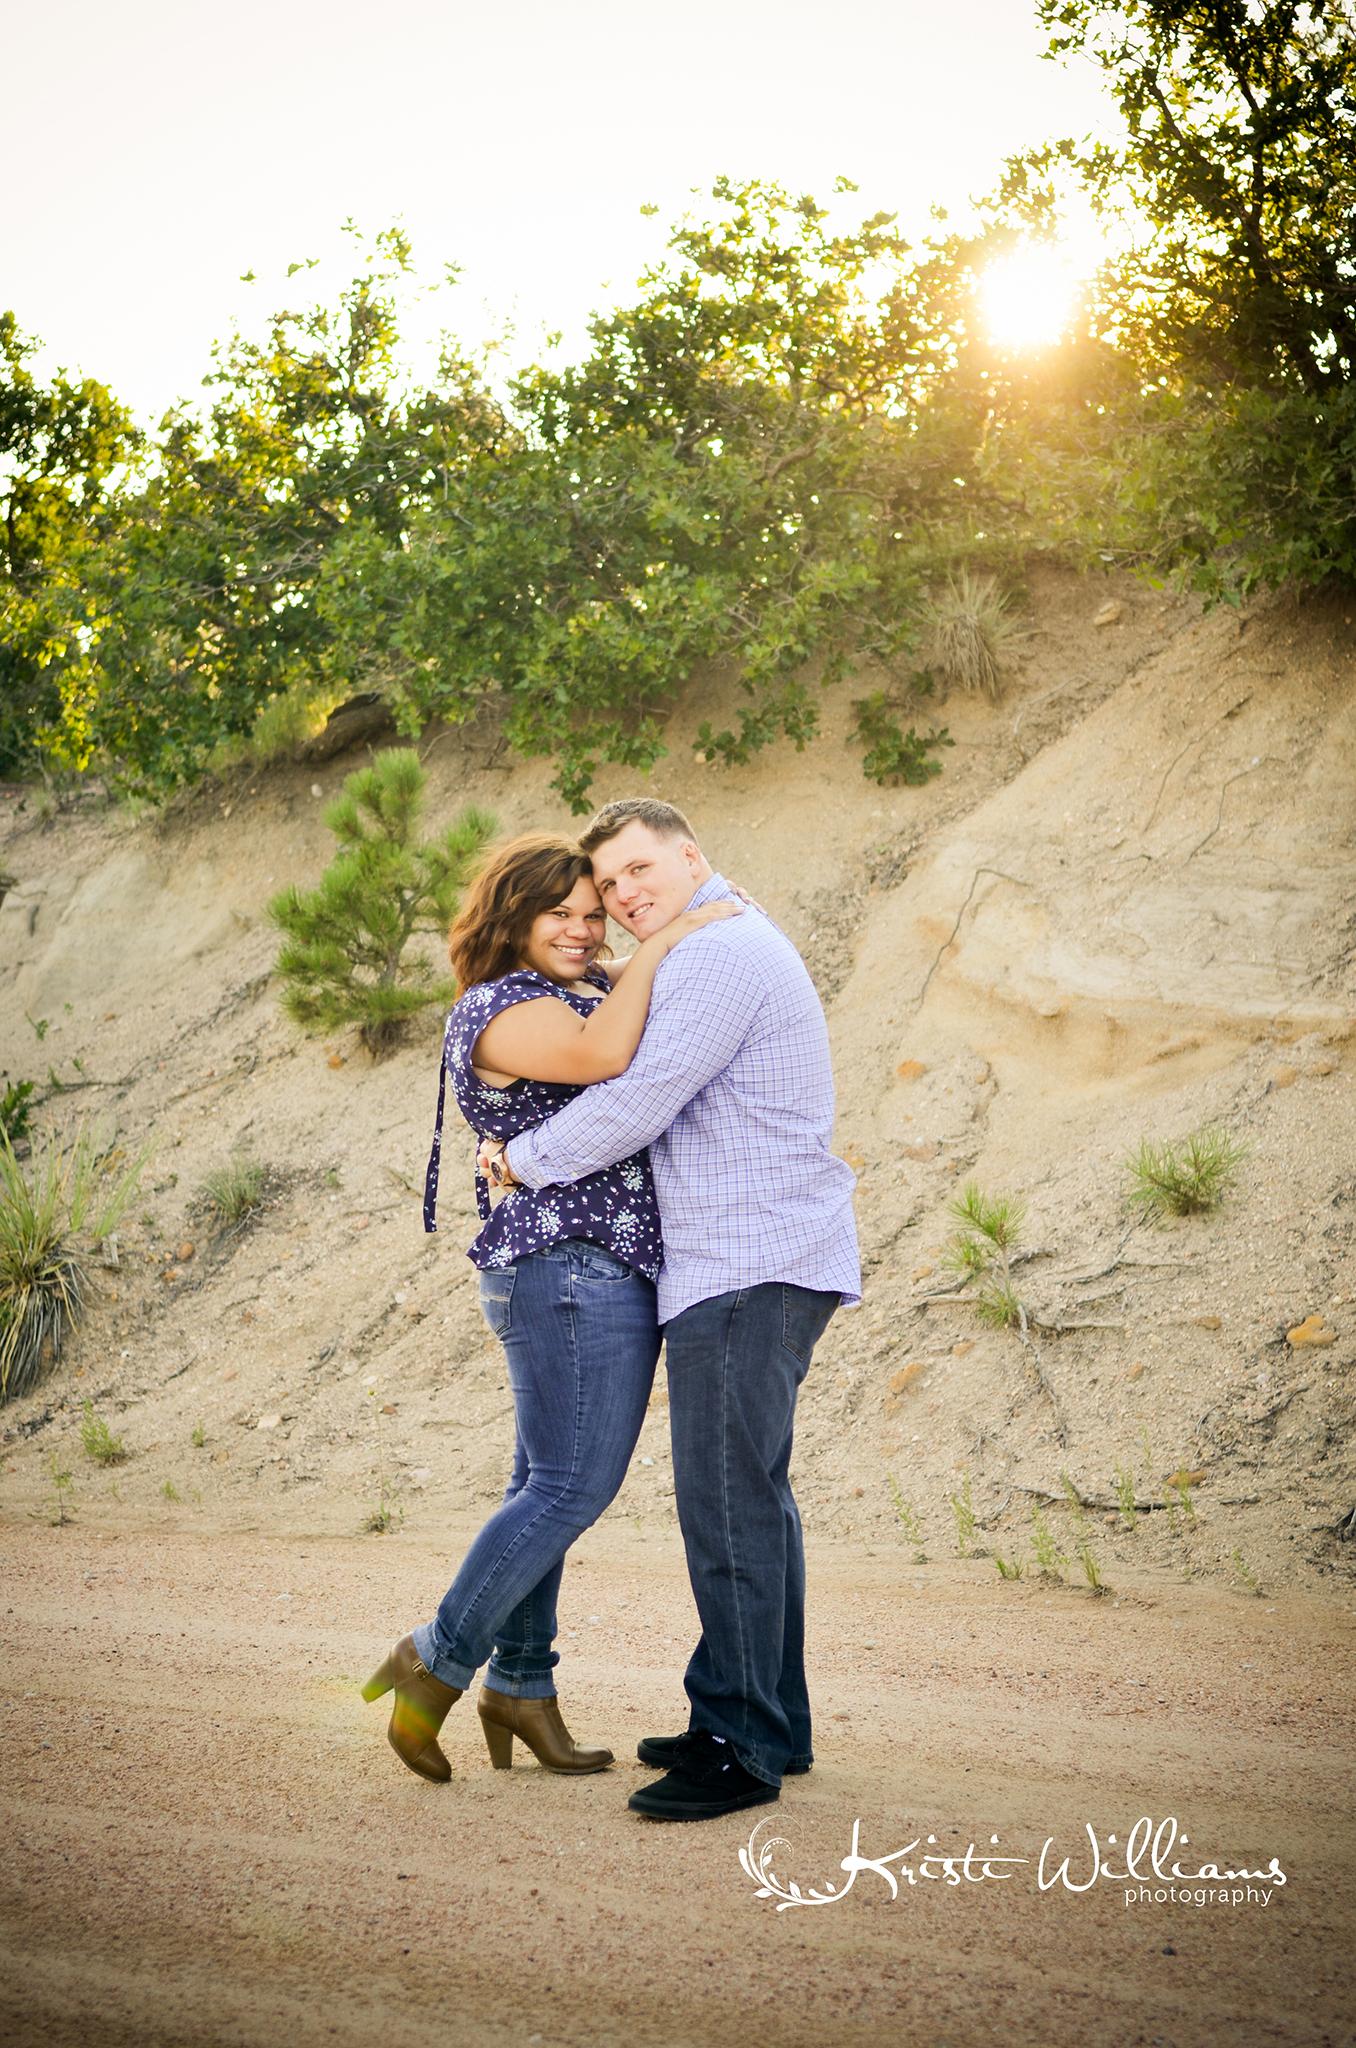 dirt road engagement couple photos colorado springs golden hour